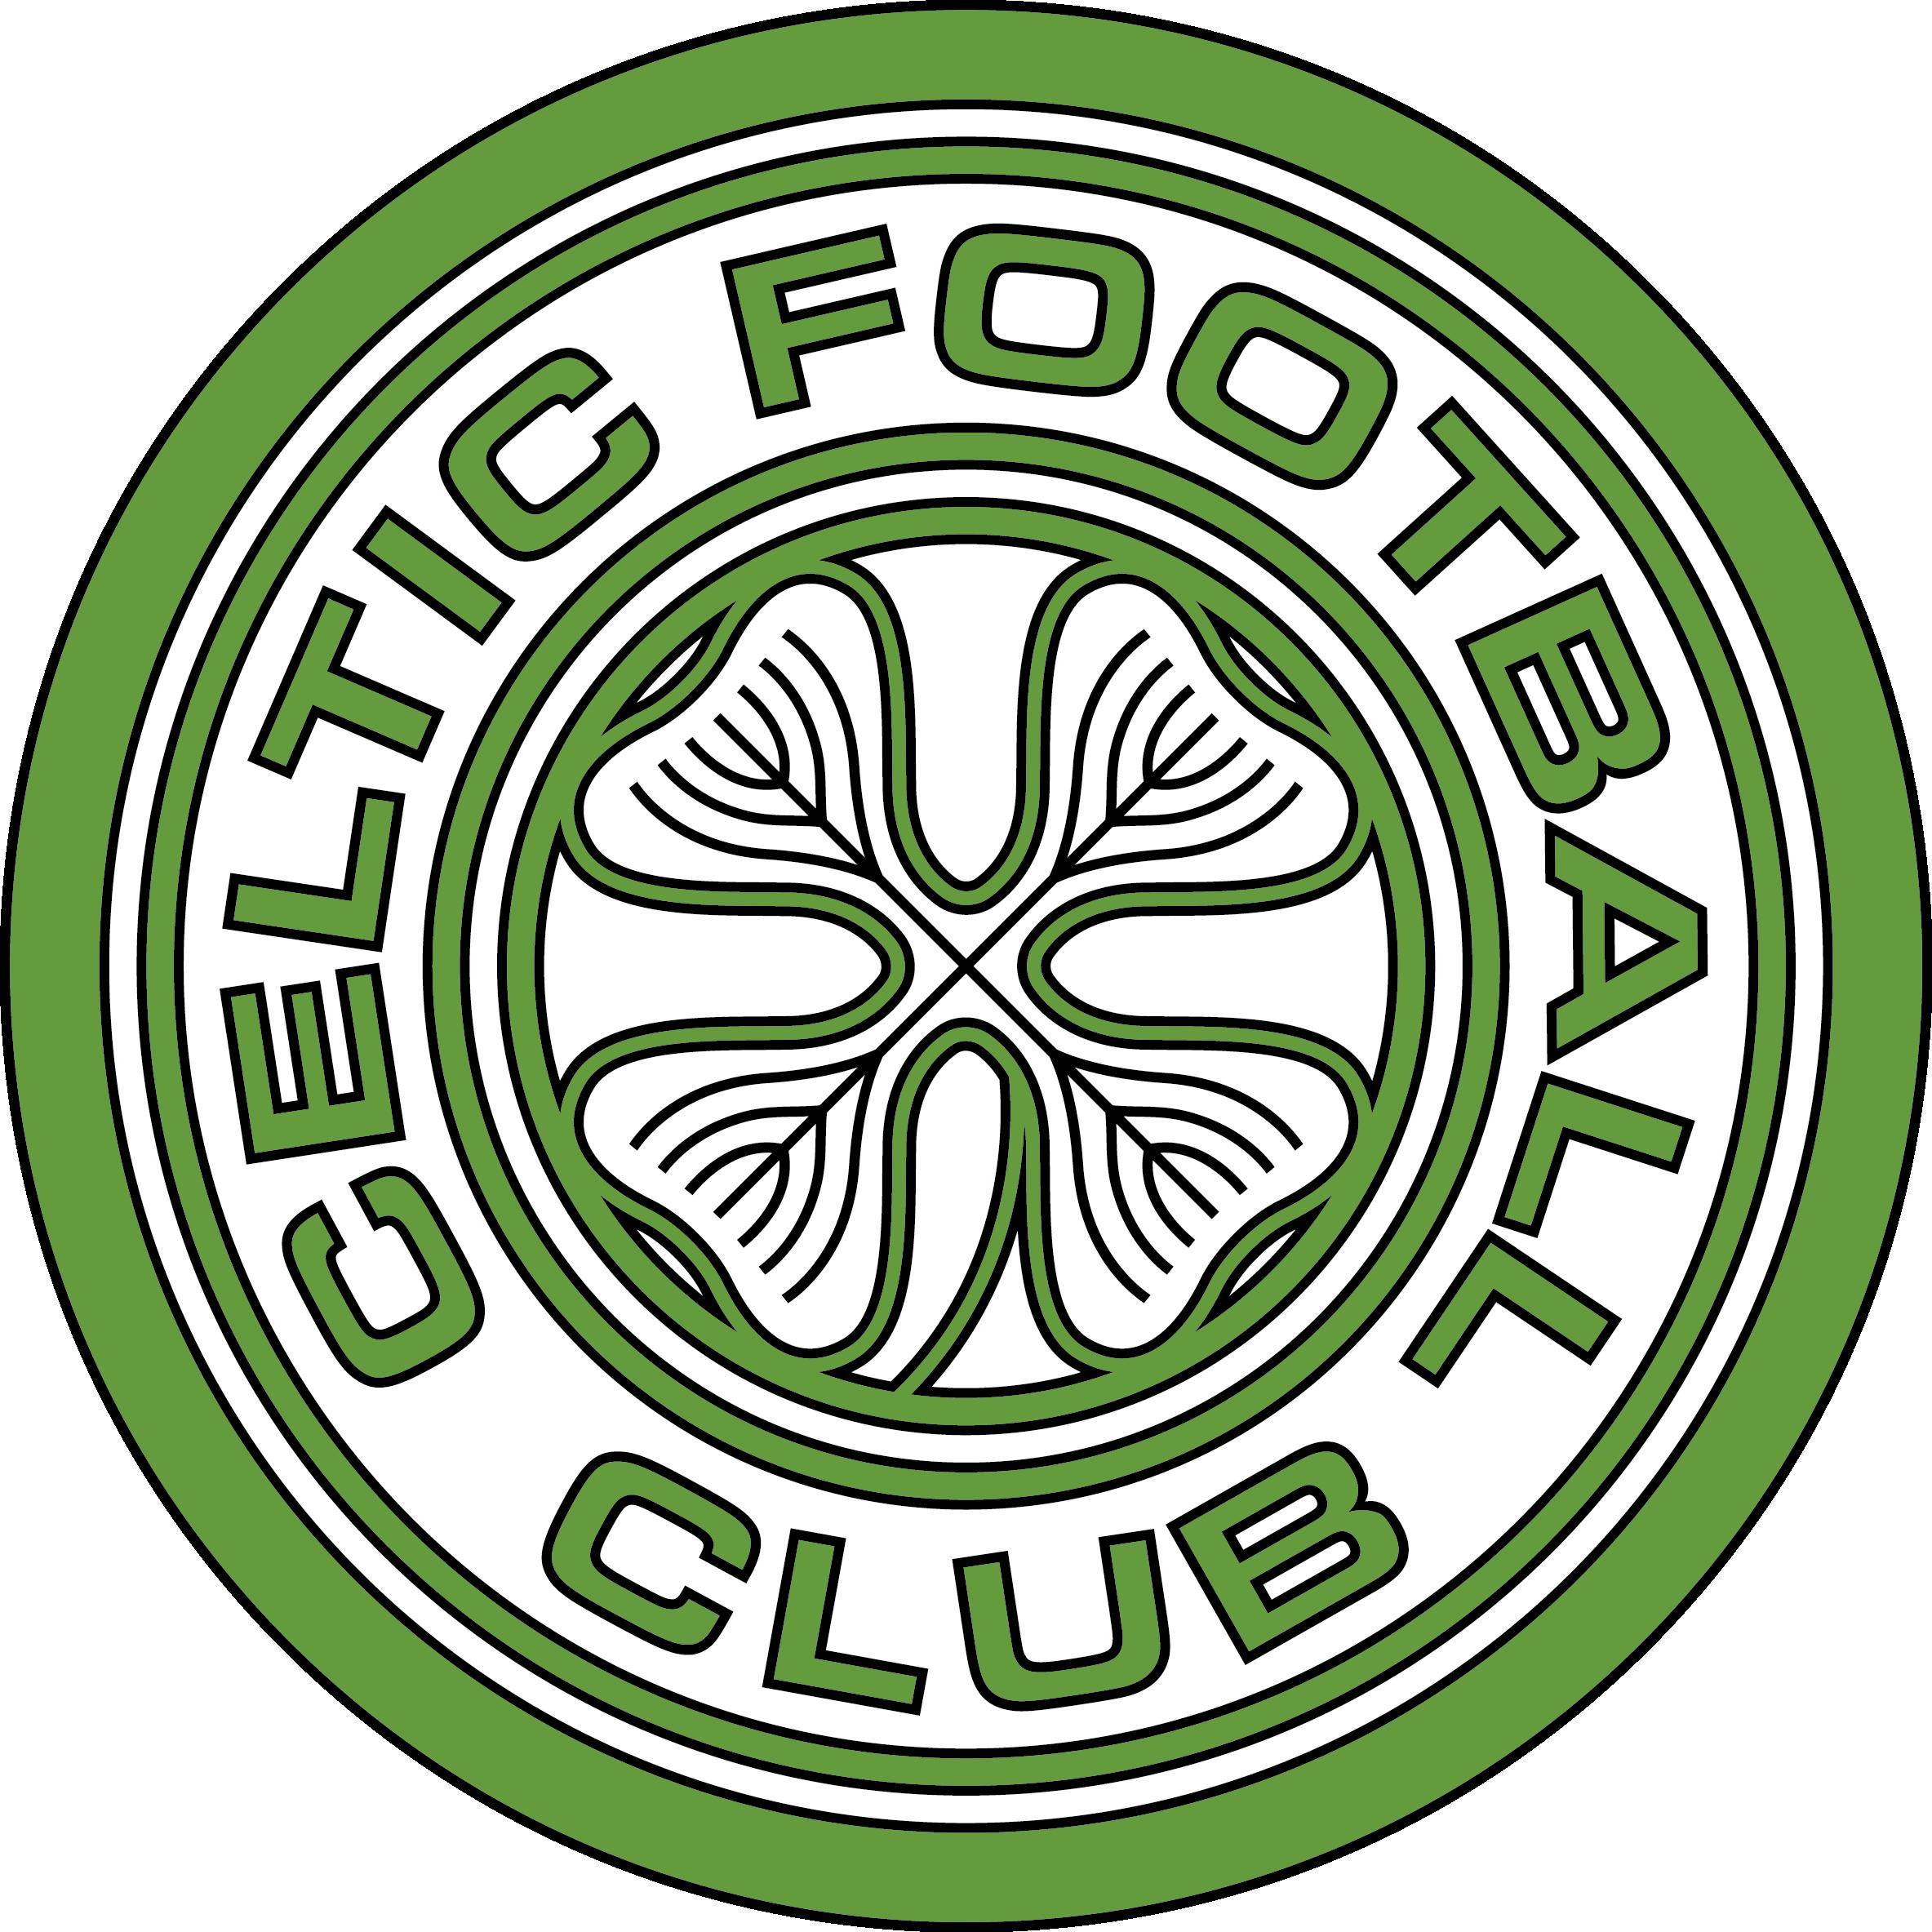 Texas ranger star clipart jpg library download FC Celtic Glasgow | Football Logos | Pinterest jpg library download